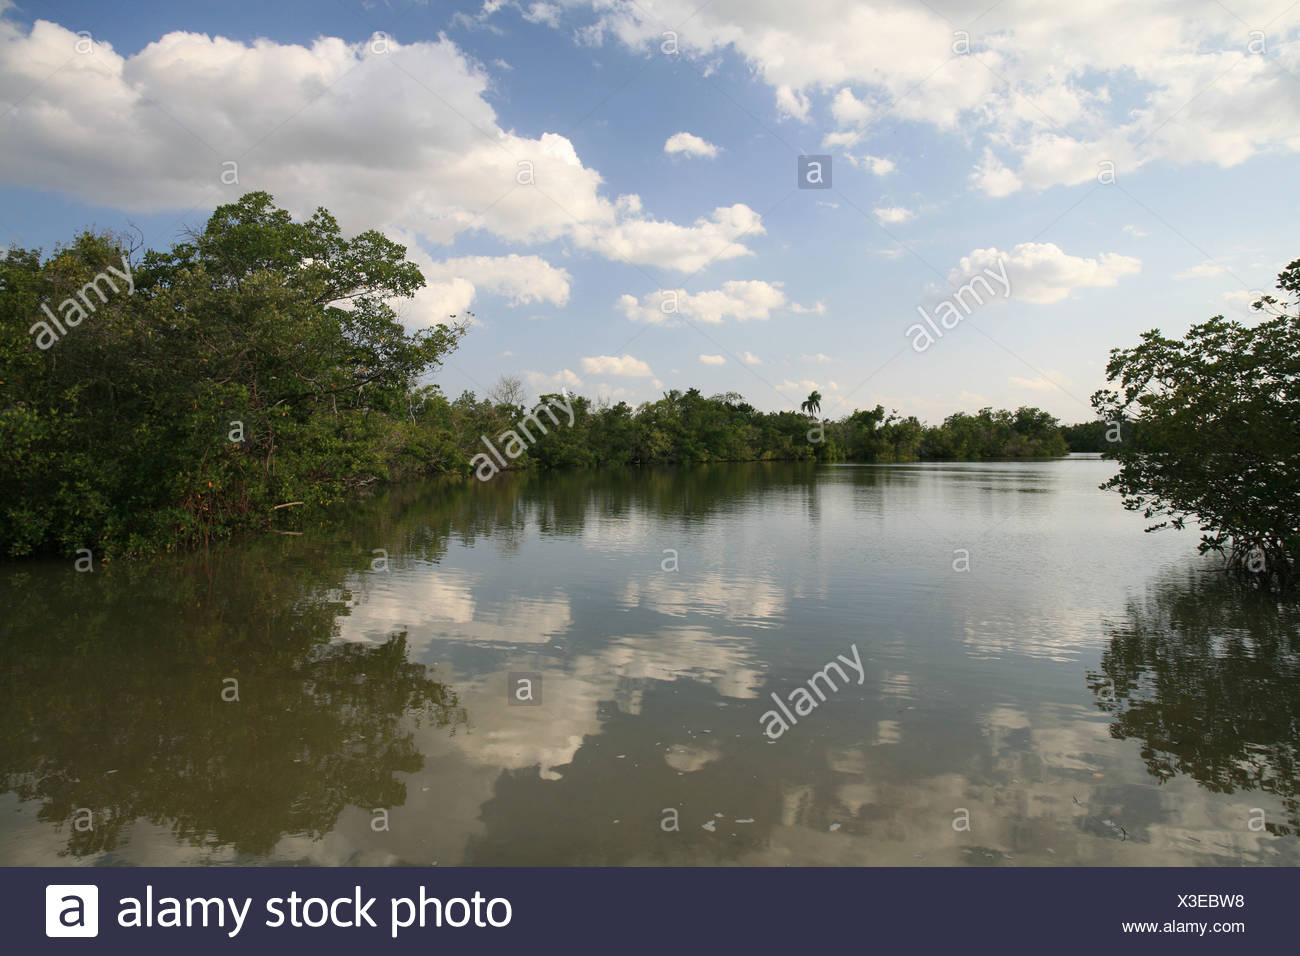 Rookery Bay National Estuarine Research Reserve, Florida, USA - Stock Image